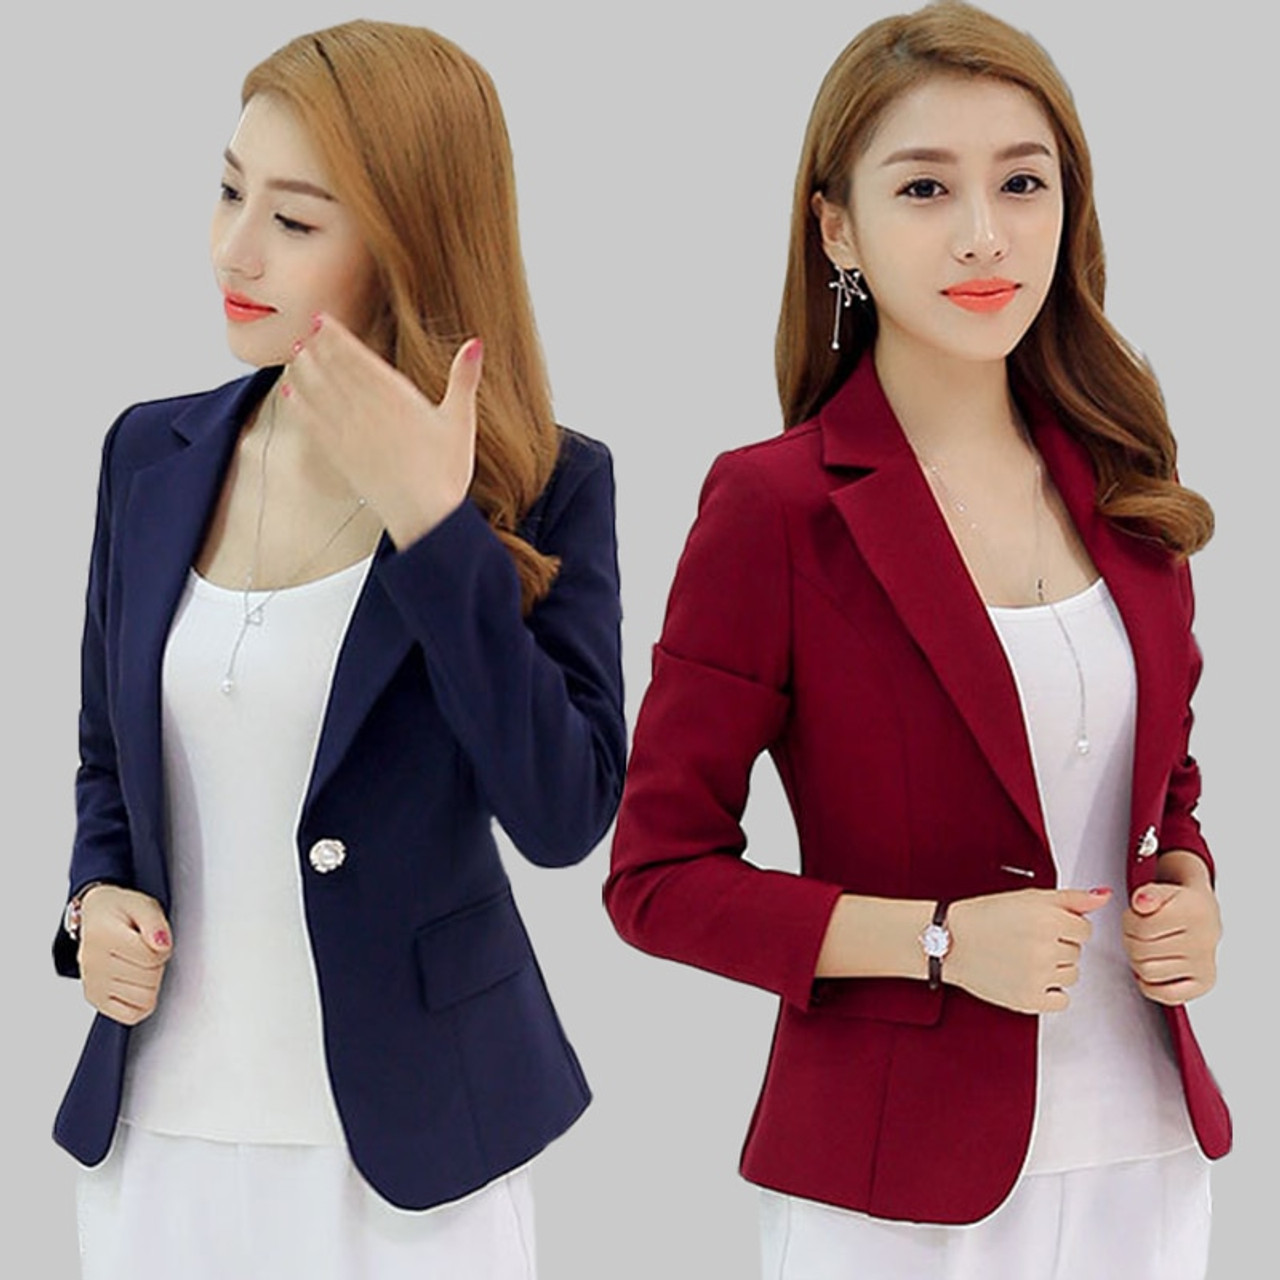 2018 New Fashion Basic Jacket Blazer Women Navy Burgundy Suit ...